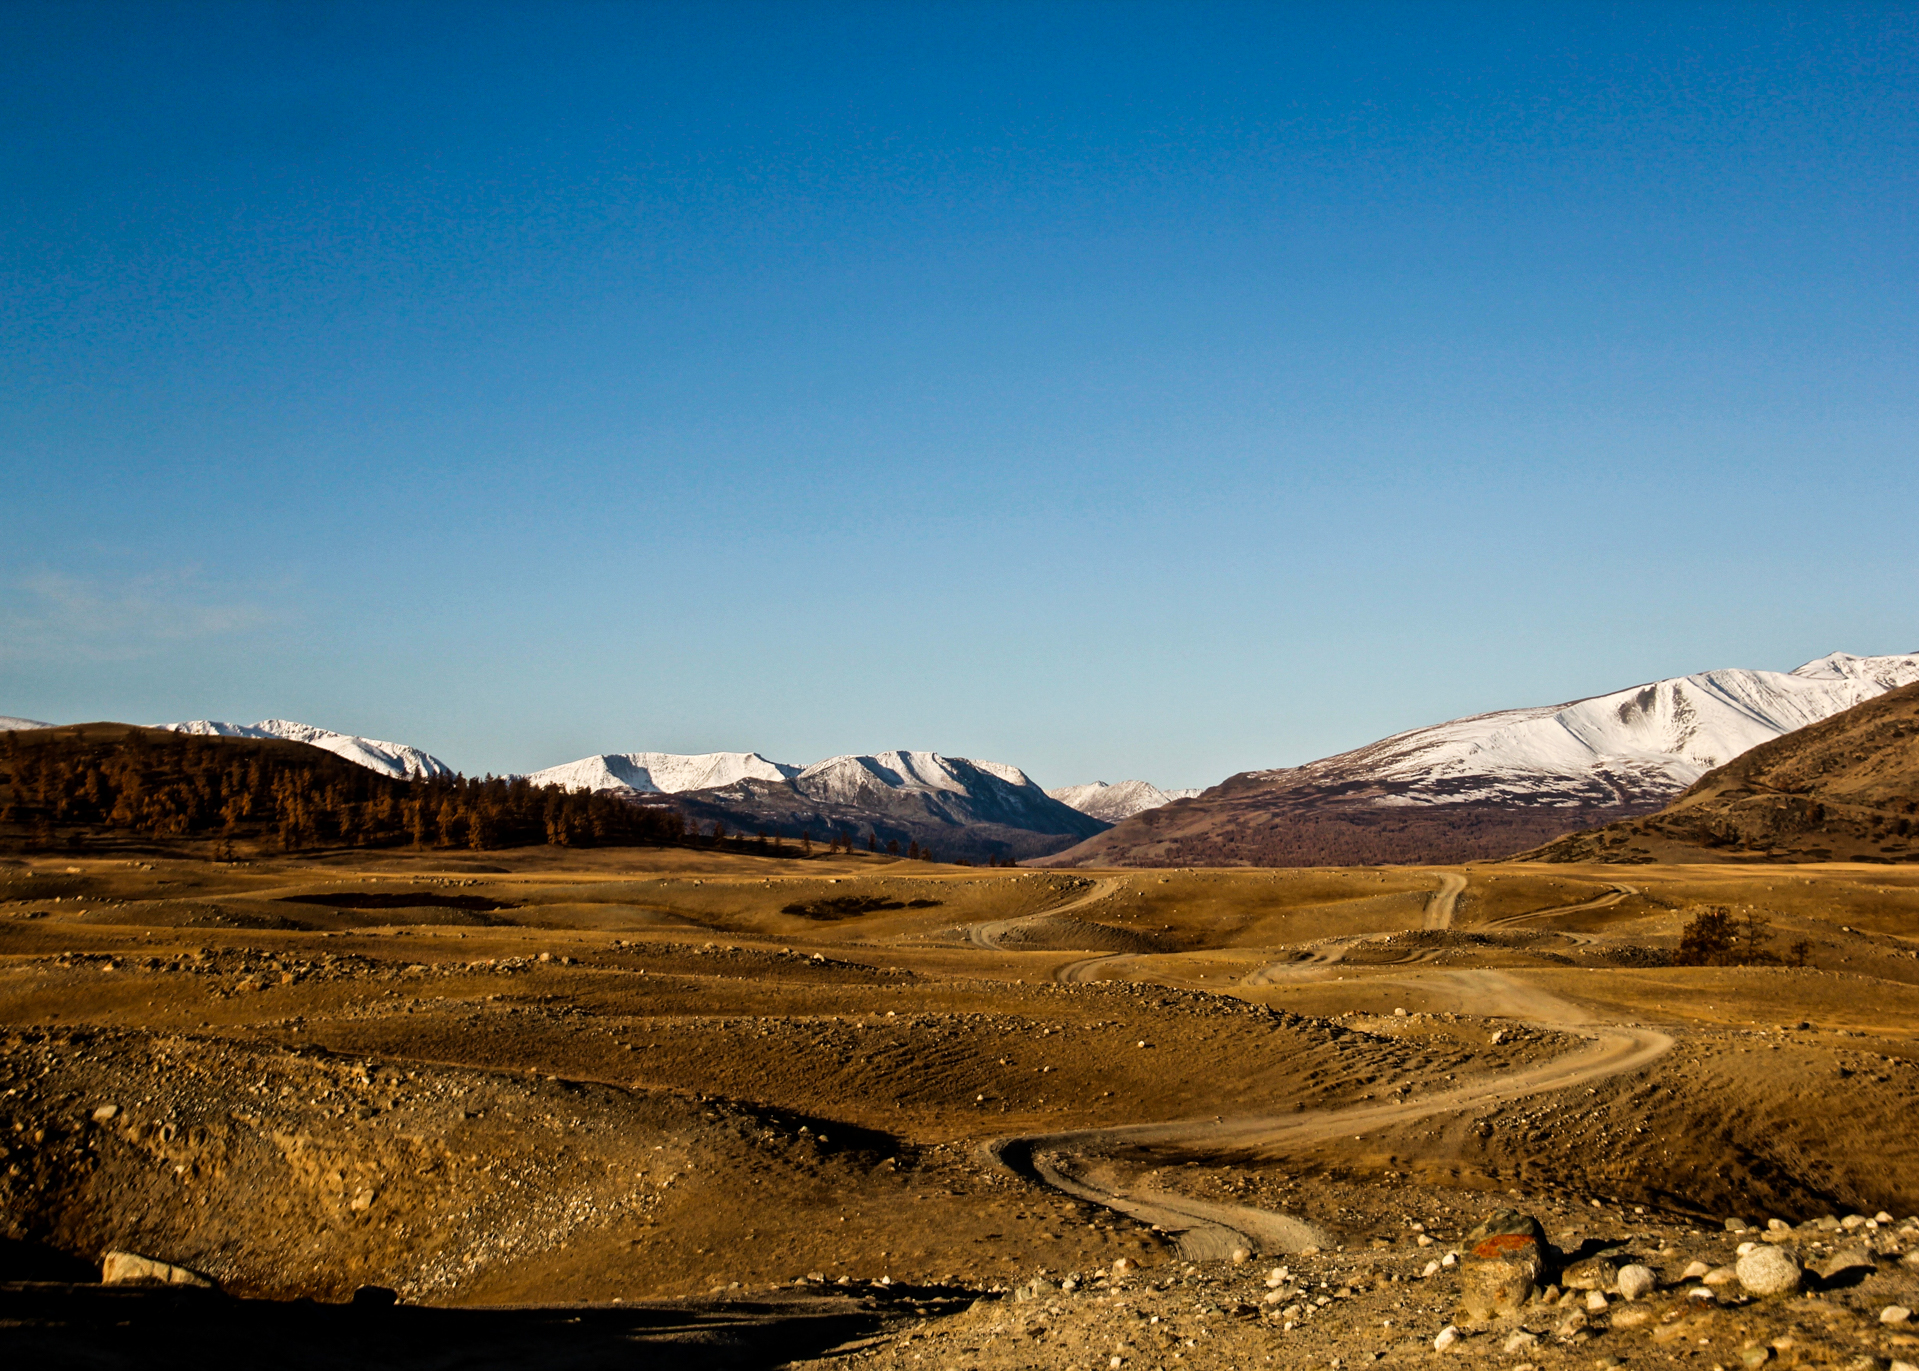 More Vast Landscapes On The Snow Leopard Tour To Mongolia